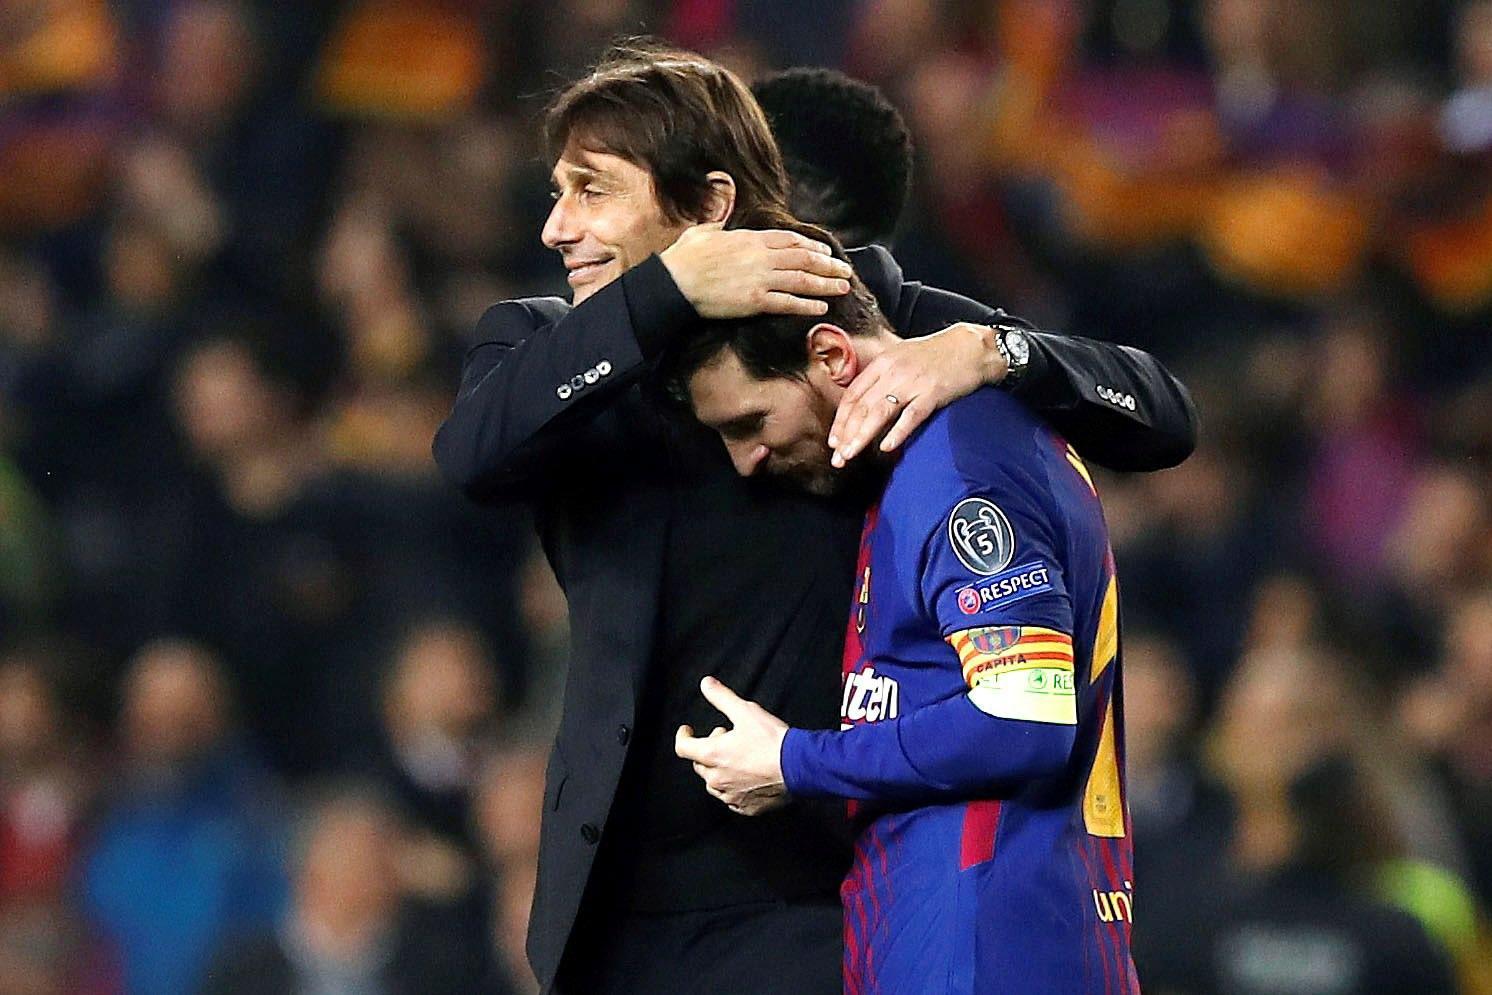 Even Conte loves the little genius